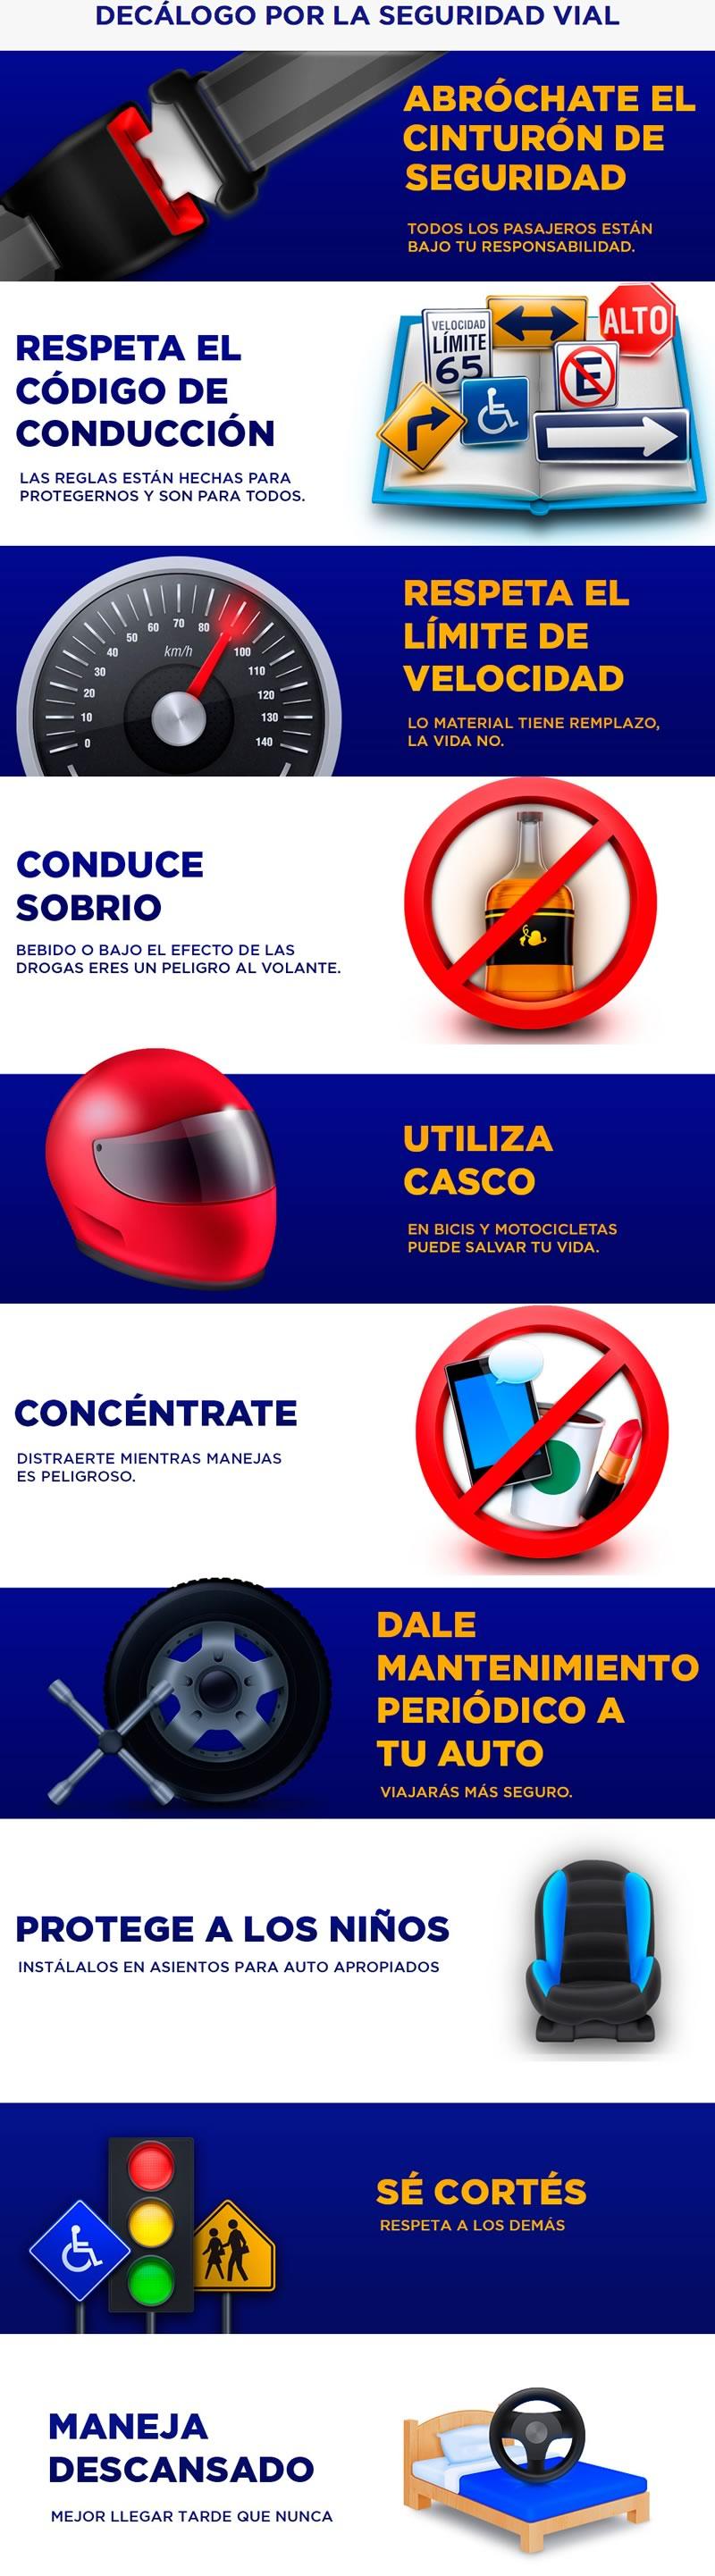 10 cosas que debes hacer para prevenir accidentes de tránsito - prevenir-accidentes-decalogo-seguridad-vial